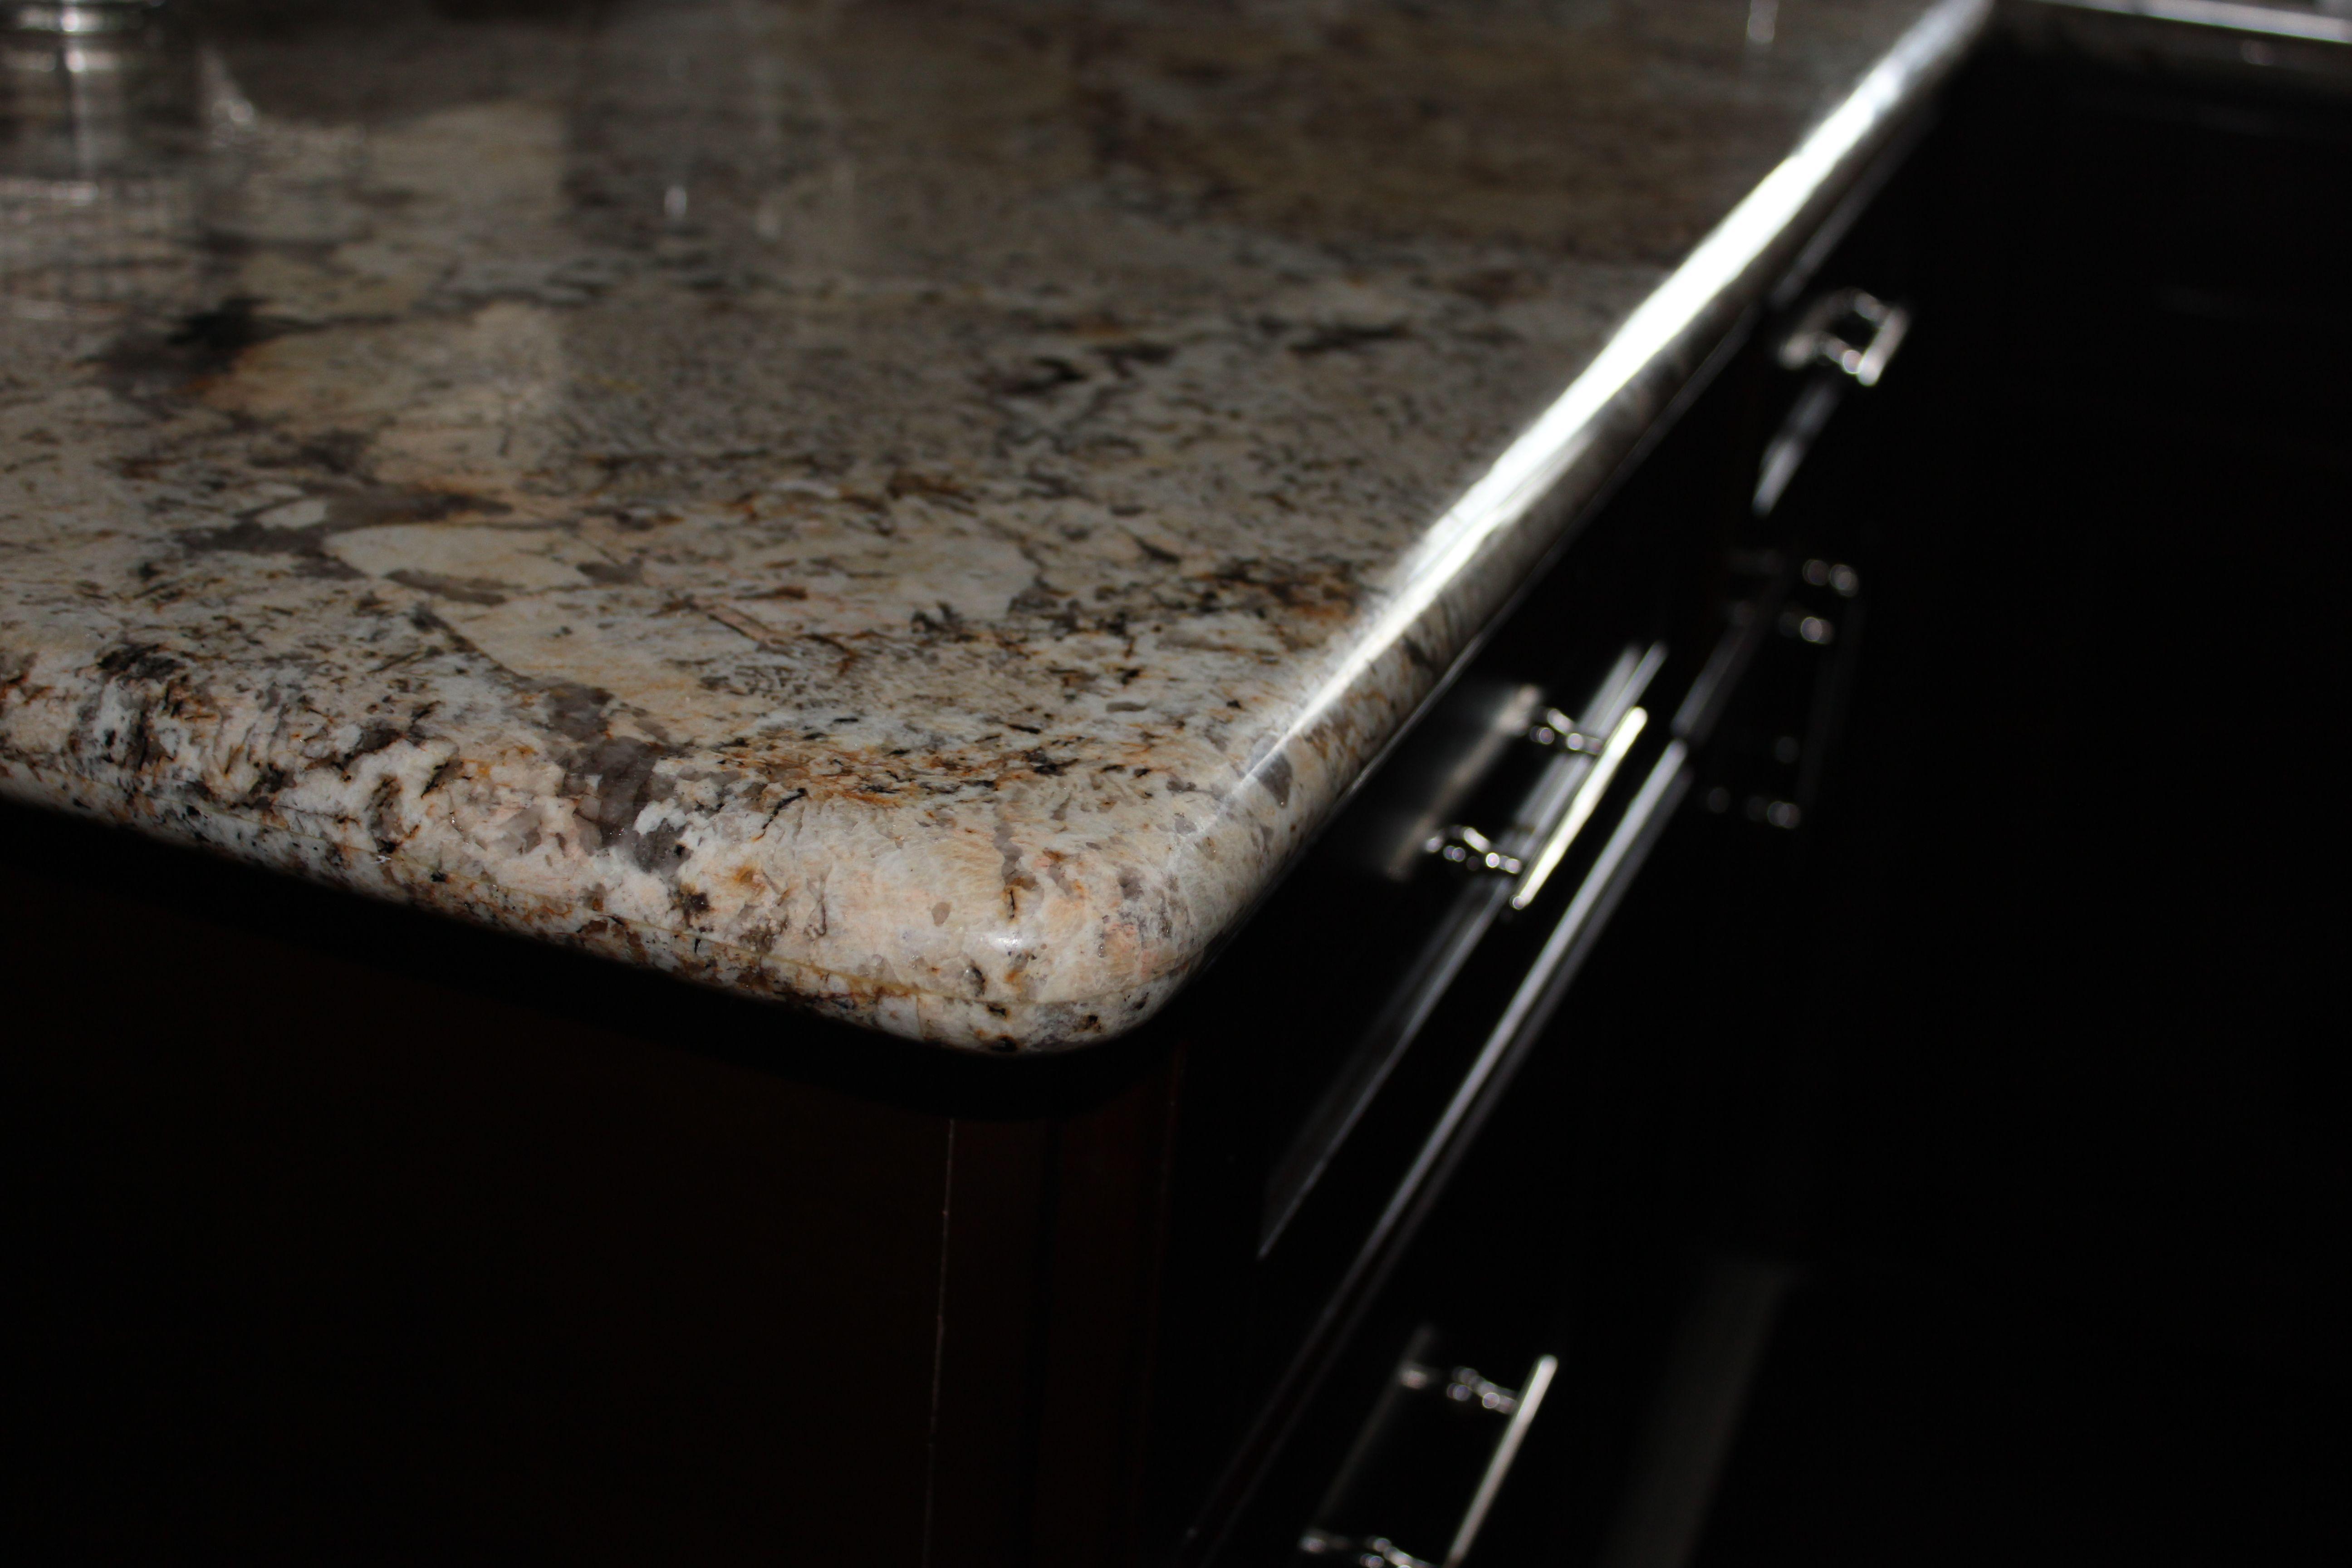 How To Drill A Hole Into Tile Granite Countertop Stone Granite